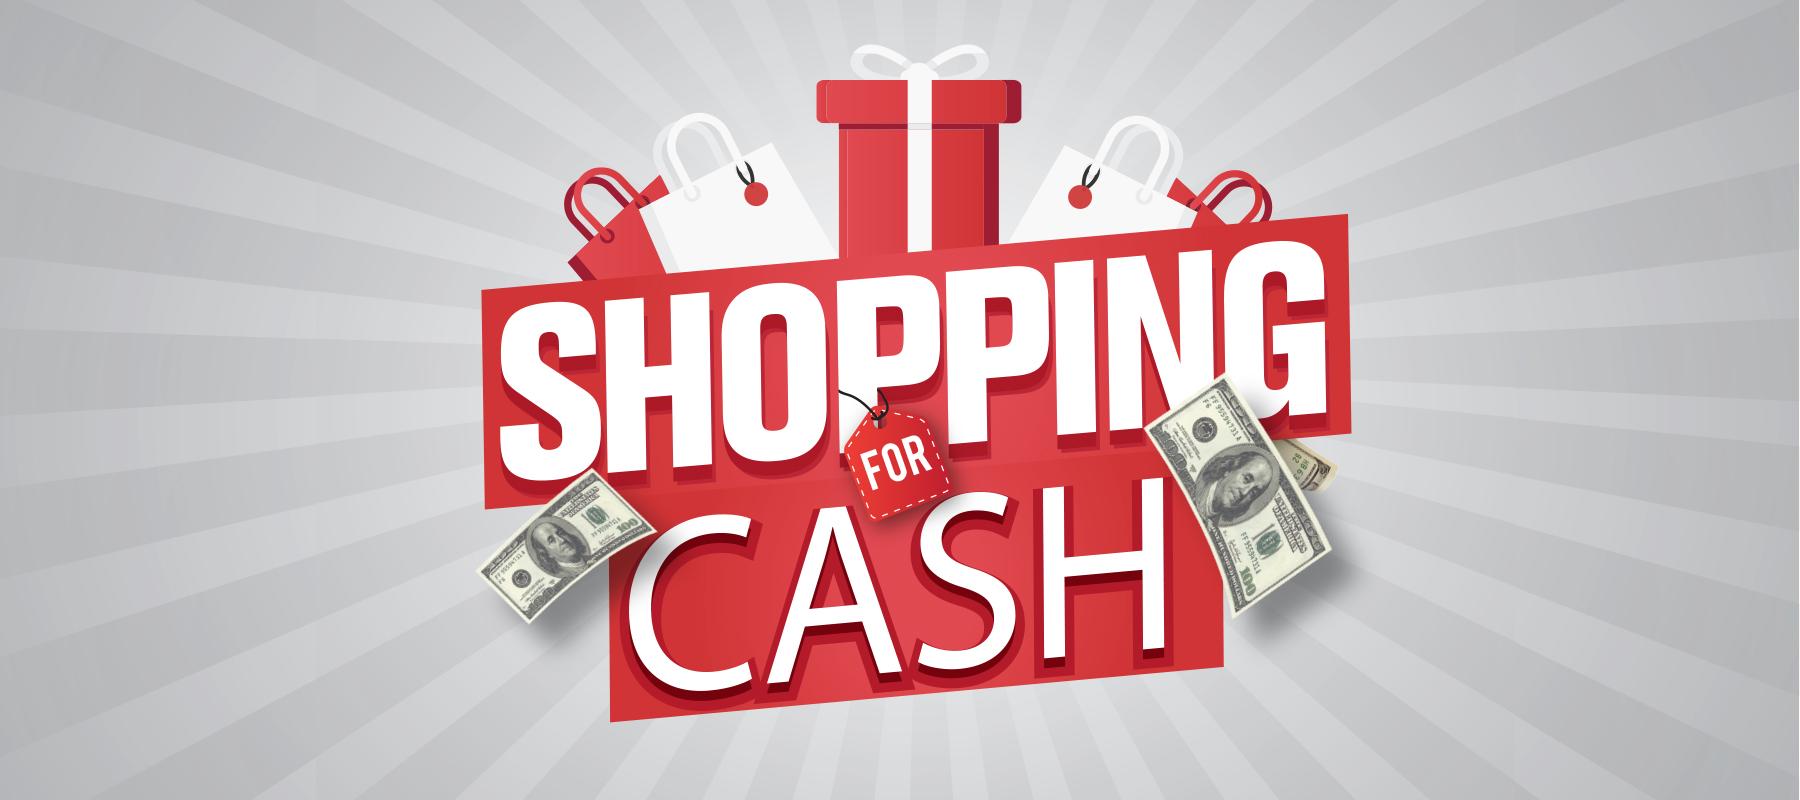 Shopping for Cash